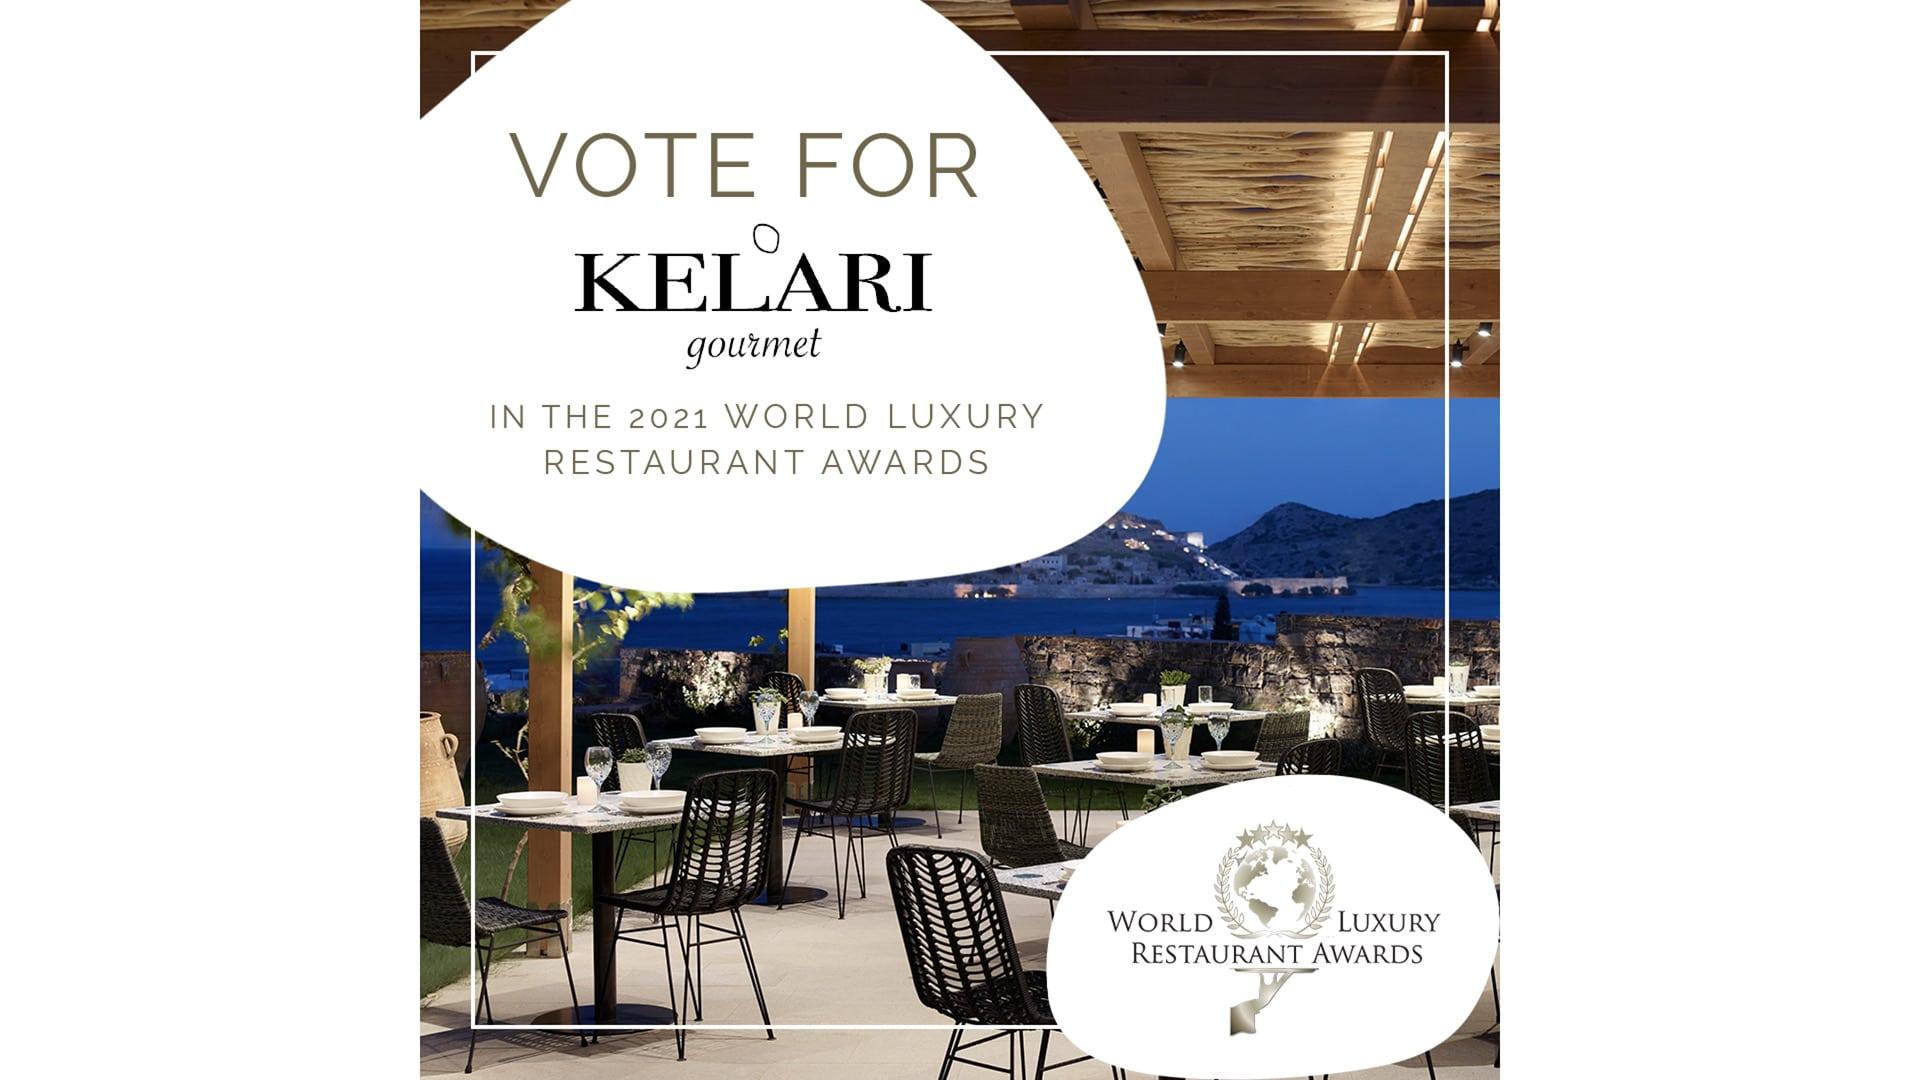 Luxury Restaurant Award Nomination for Cayo's Kelari Gourmet Restaurant